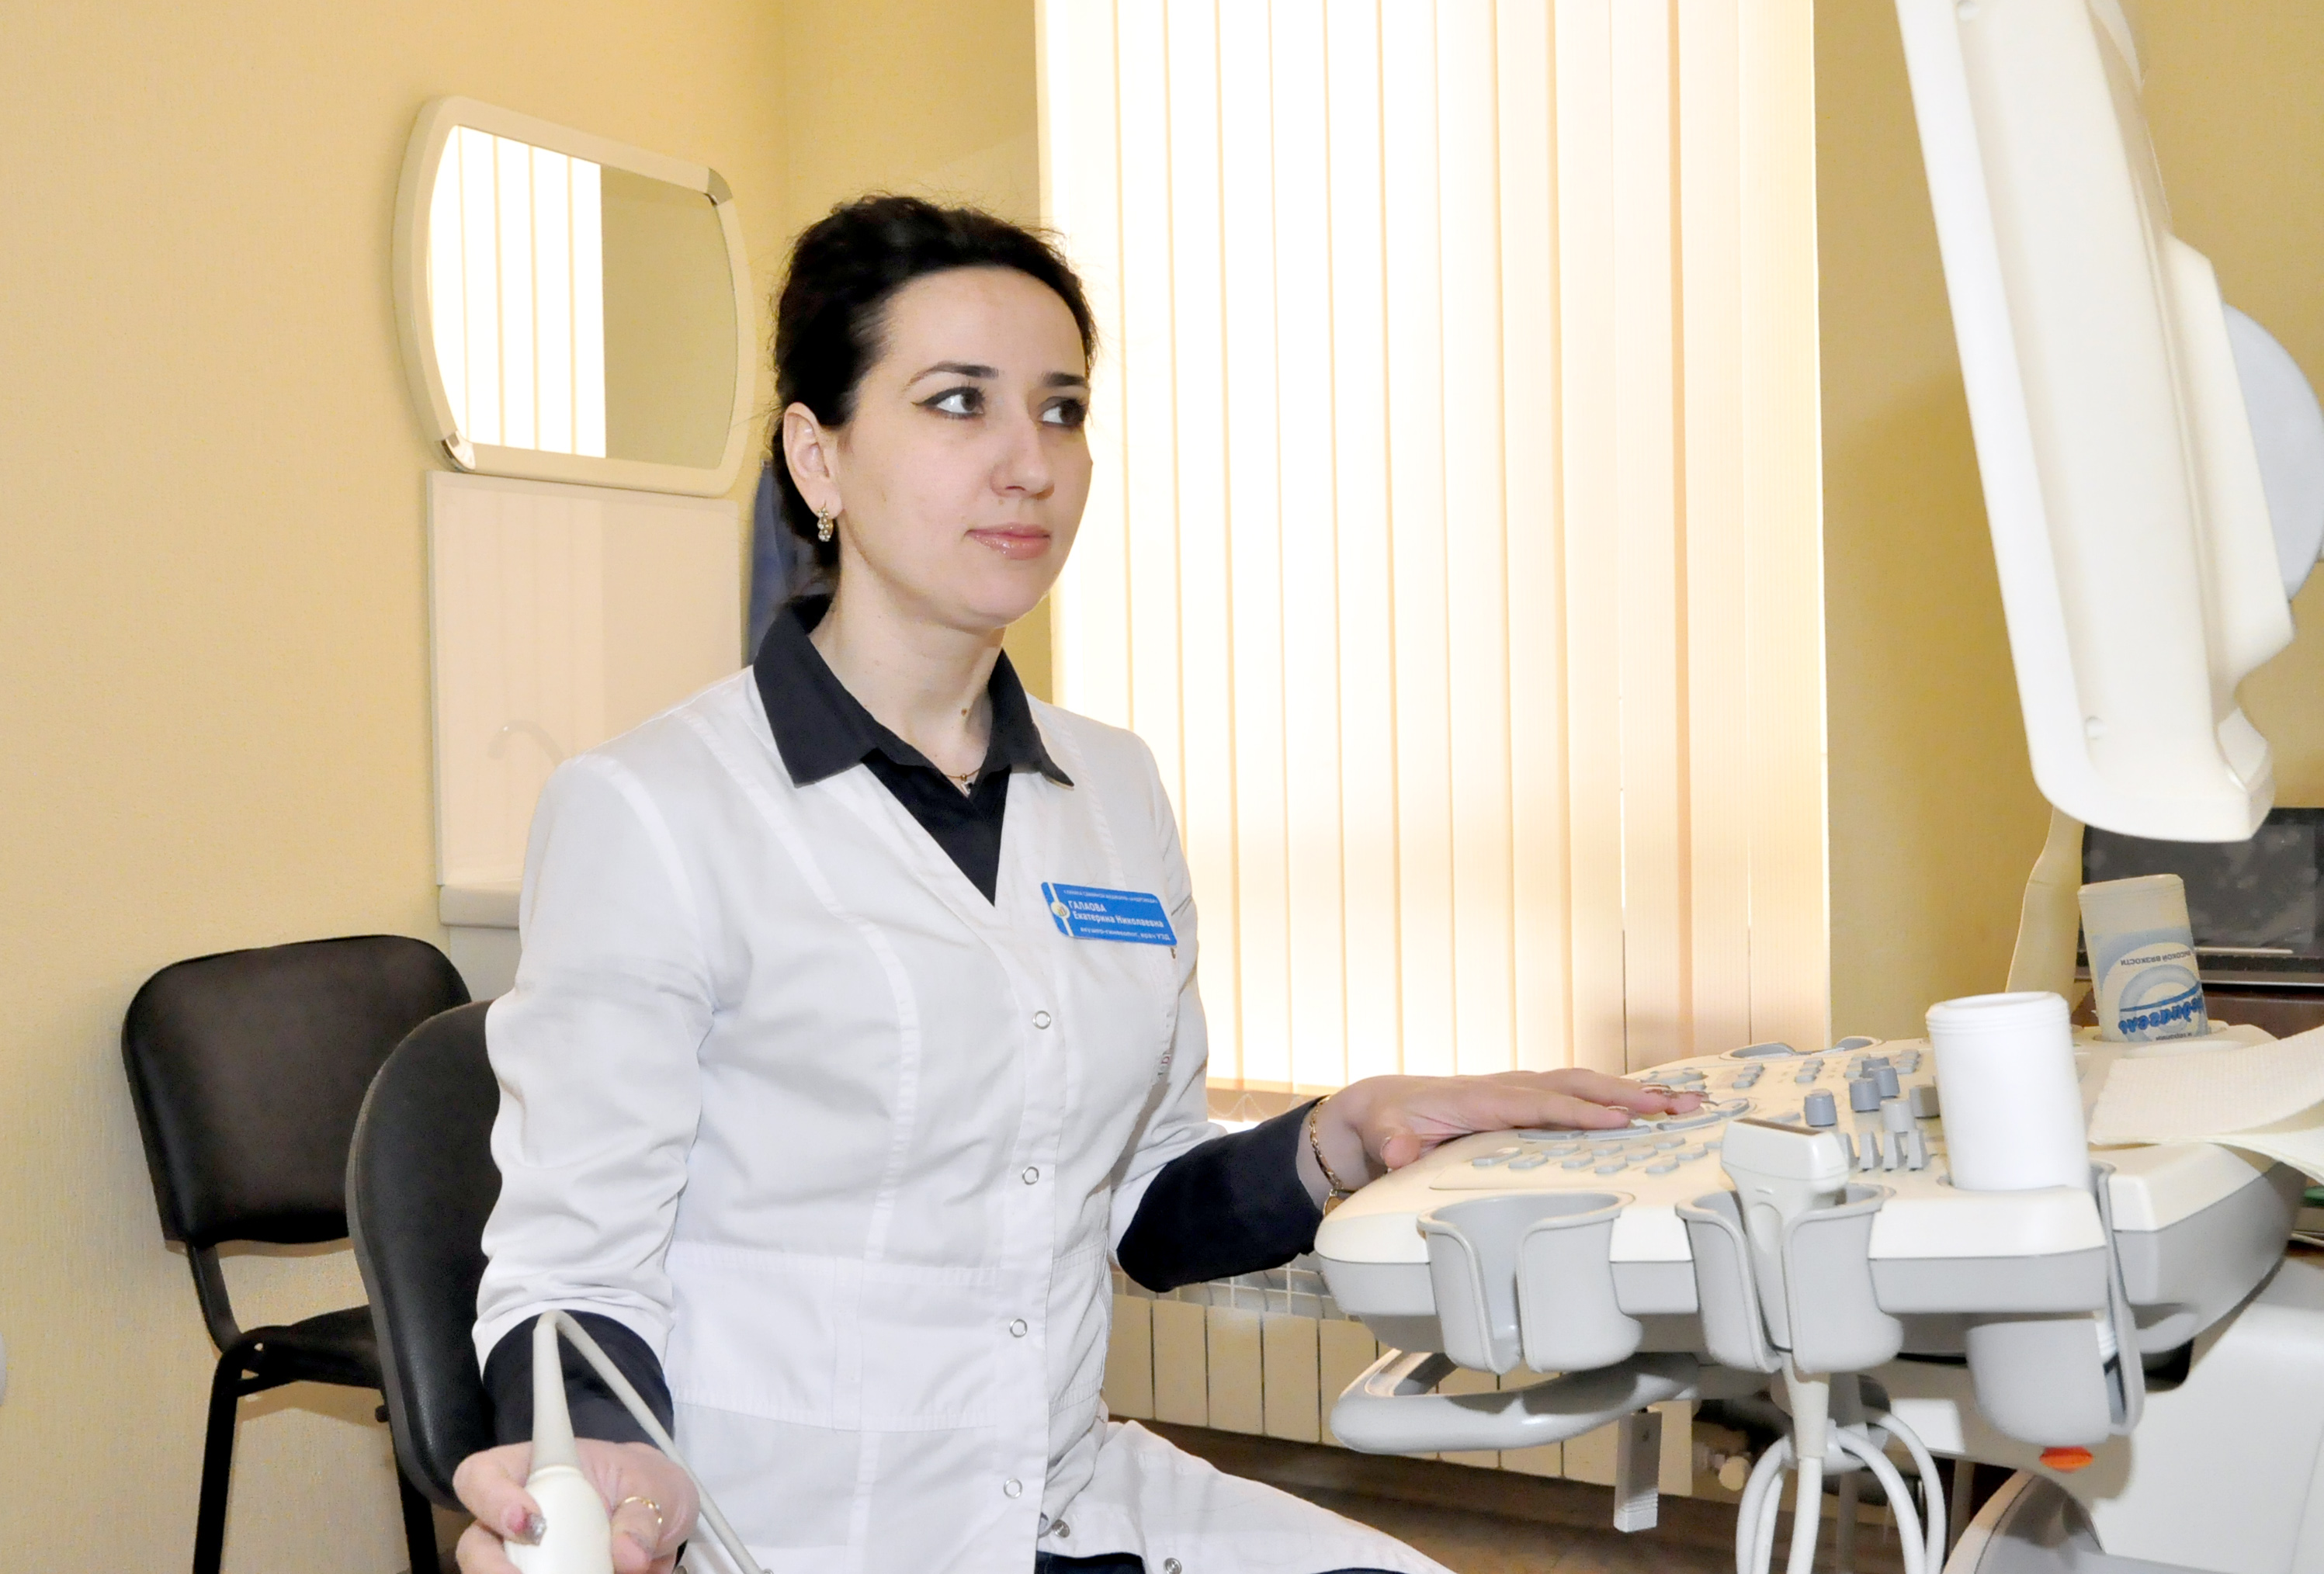 Галаова Екатерина Николаевна